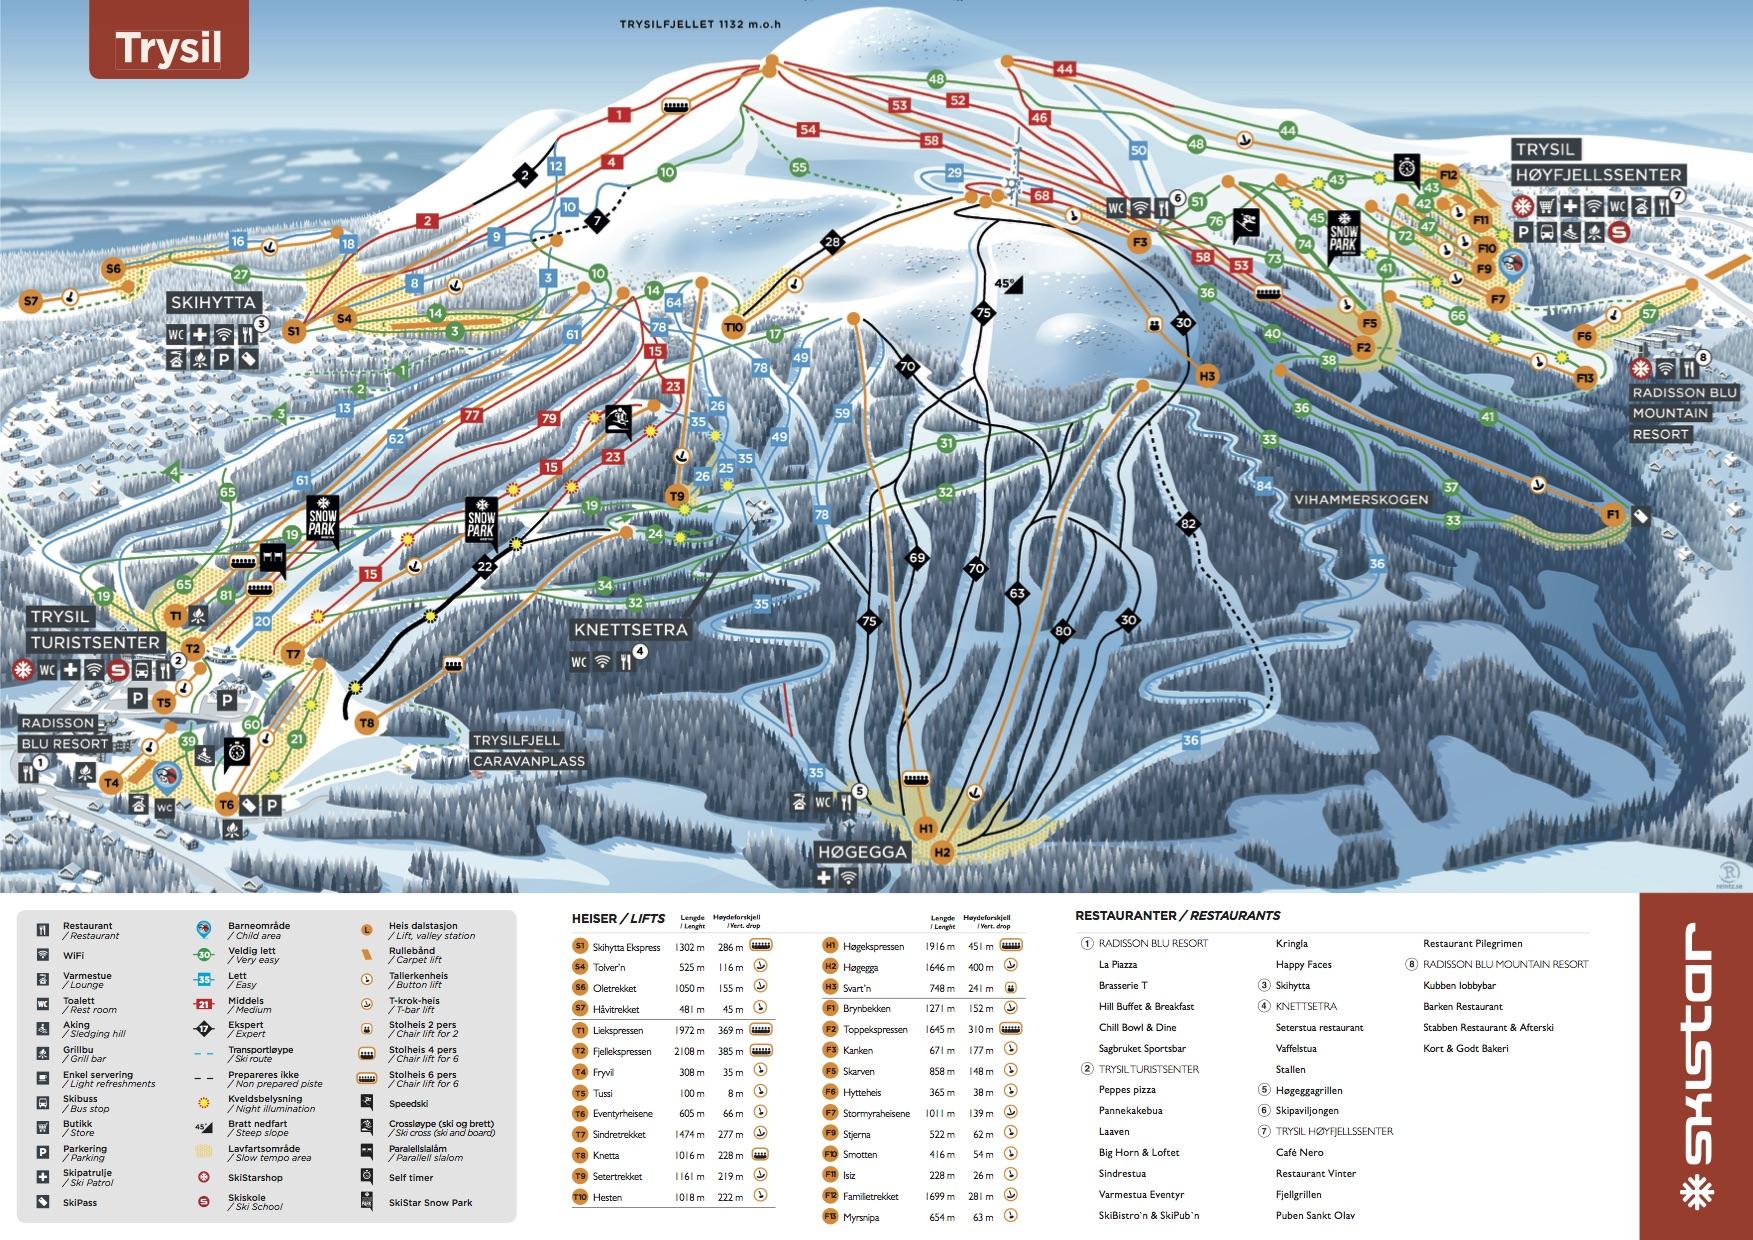 Trysil雪道地图